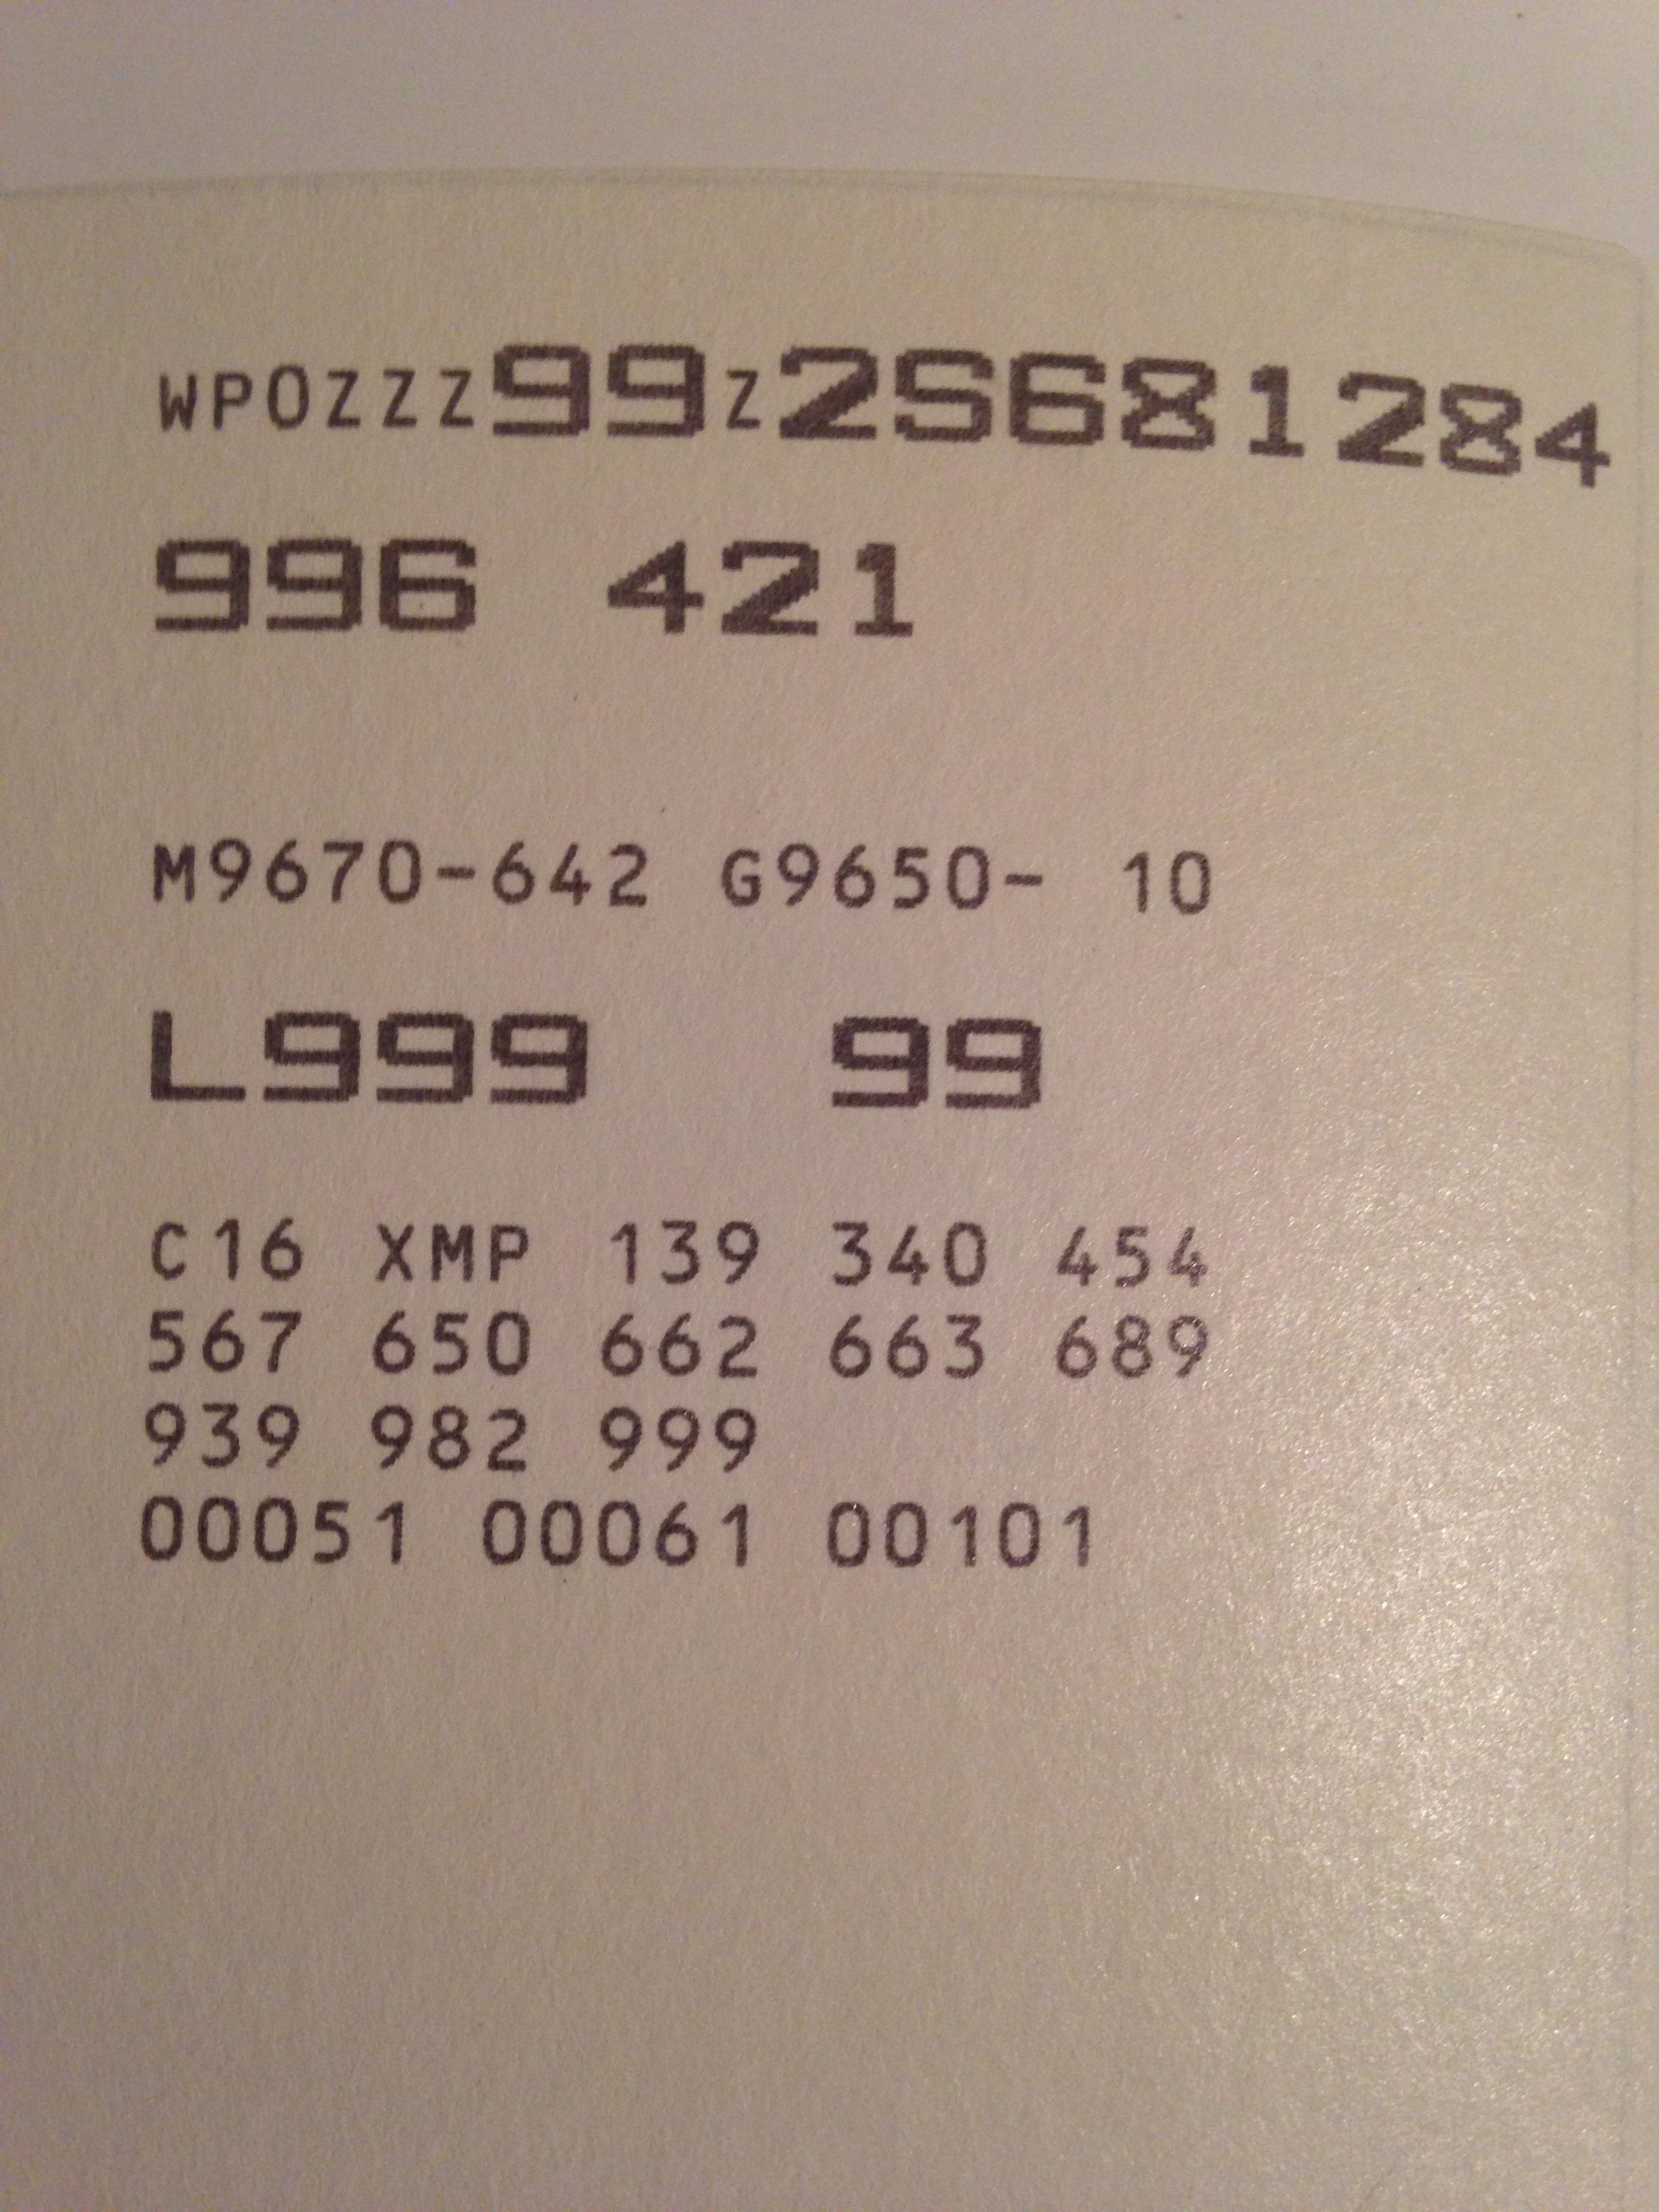 Porsche Country Codes Philip Raby Porsche